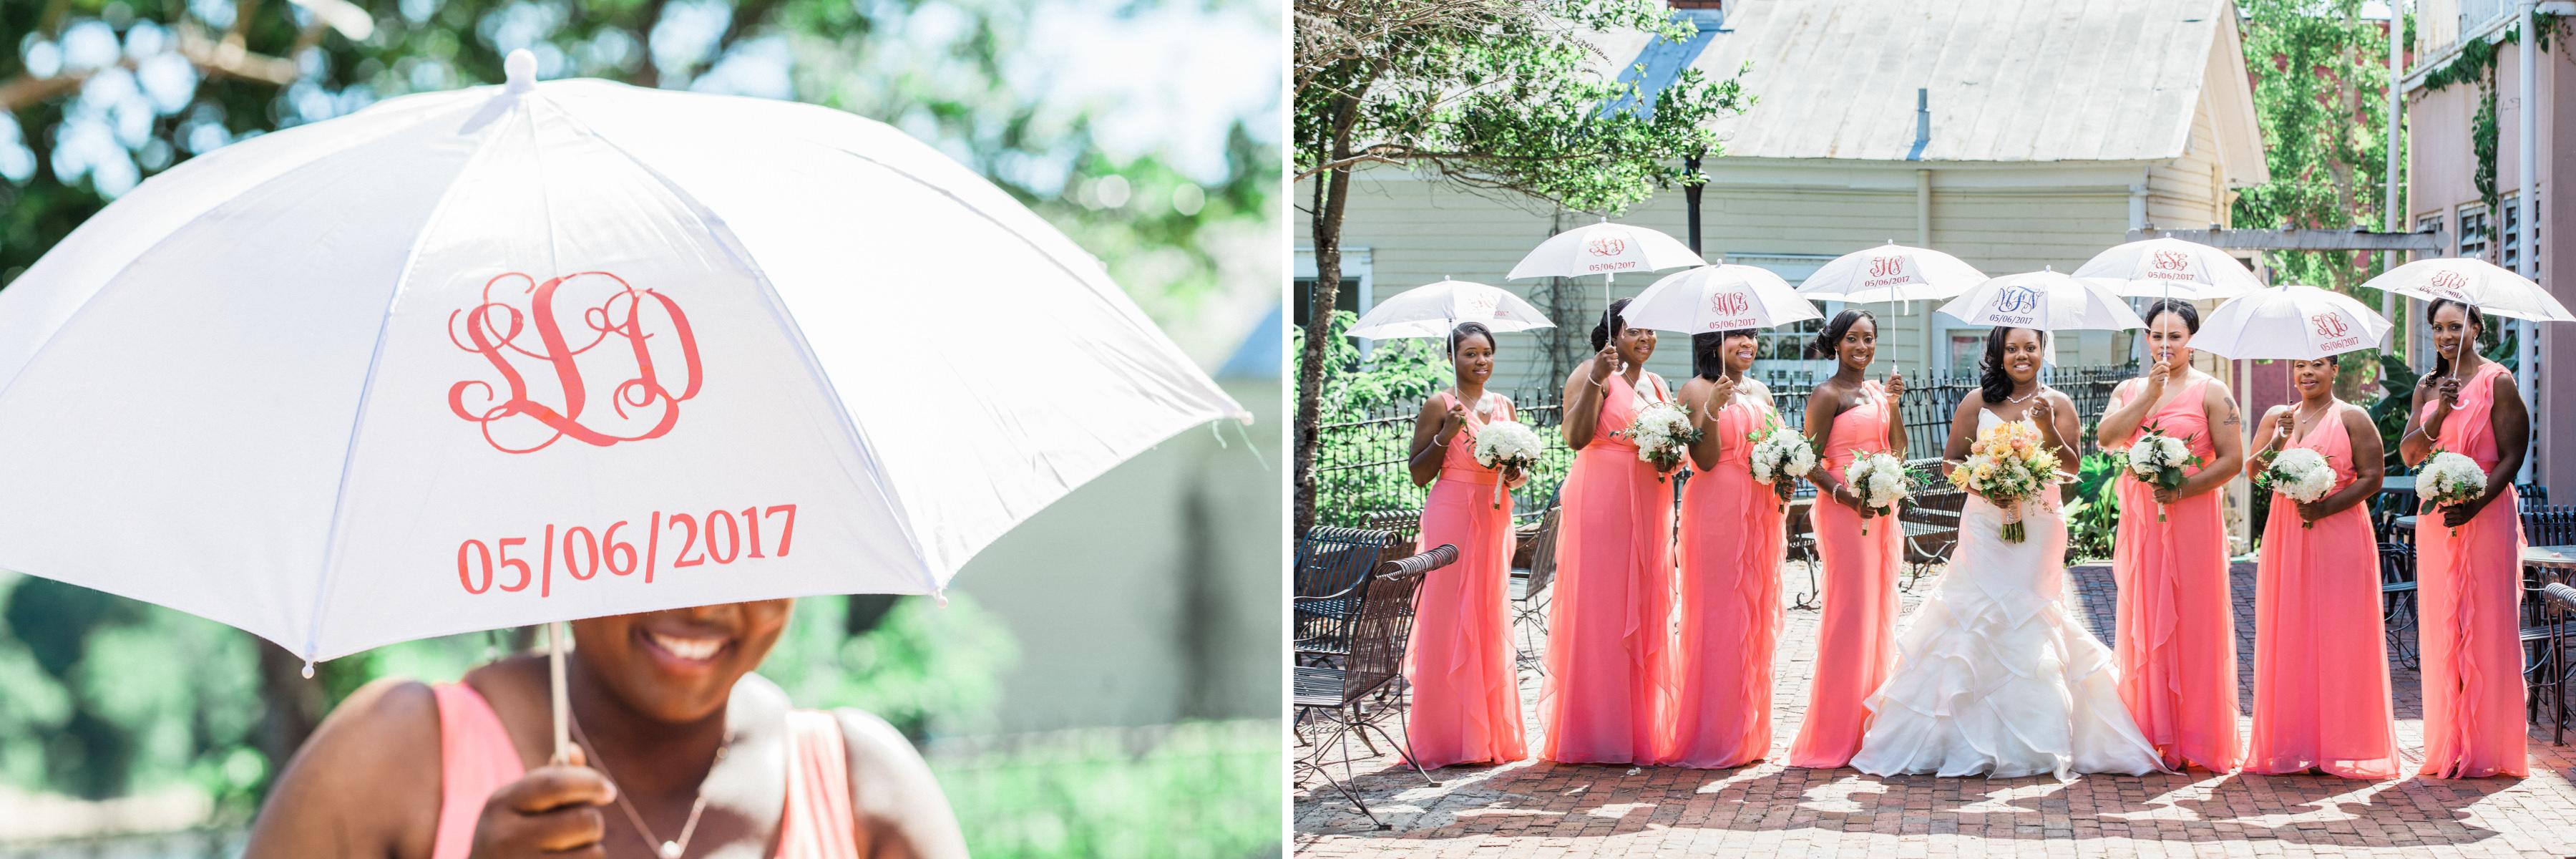 FLOWERS_WEDDING_SELMA_ALABAMA_WEDDING_PHOTOGRAPHY_46